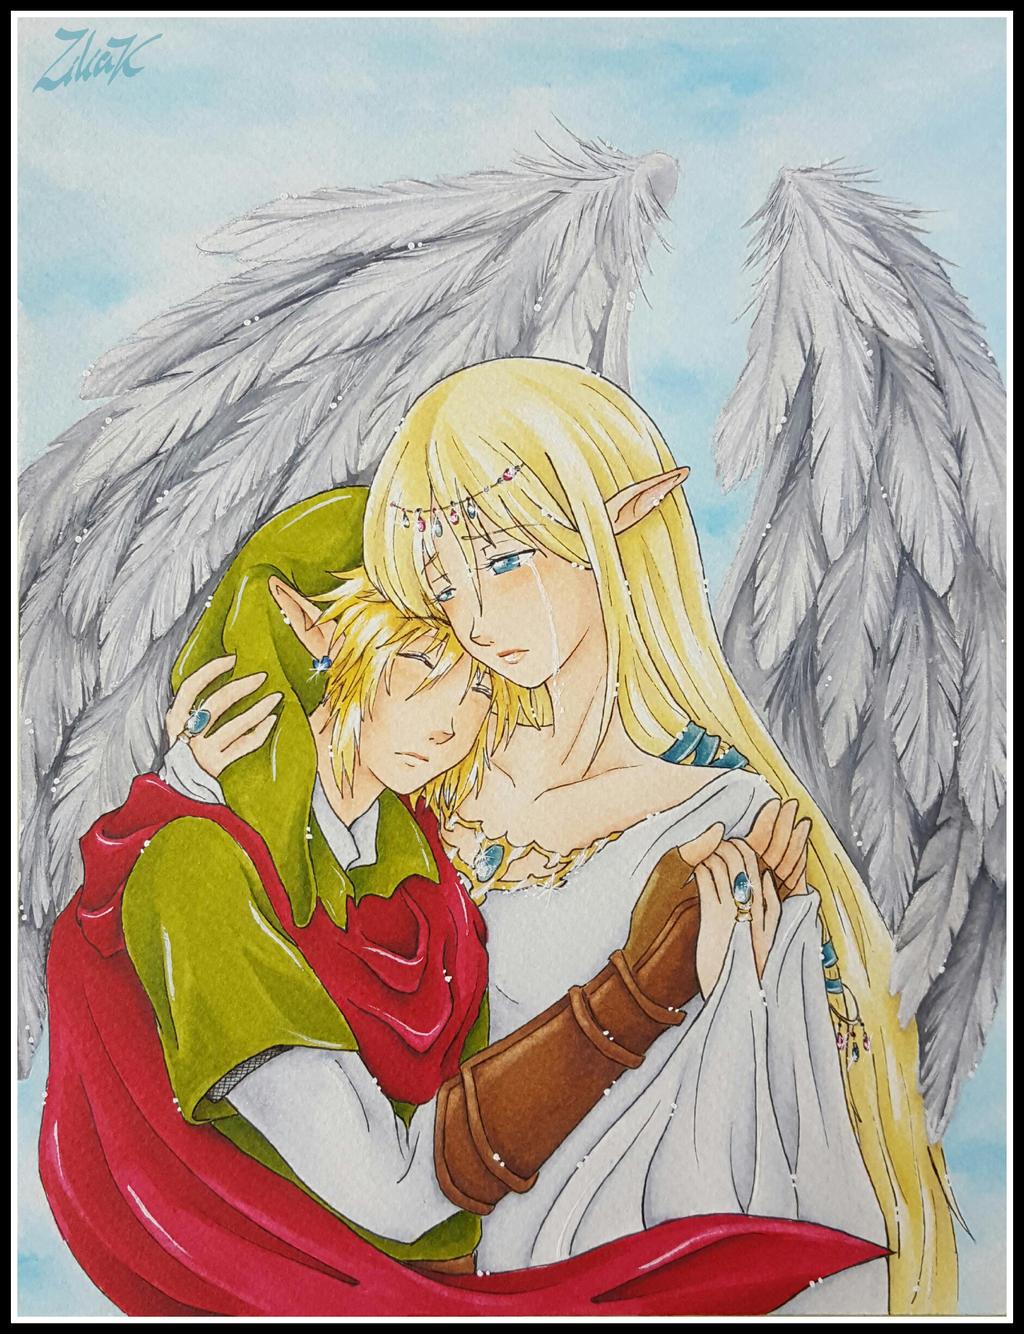 On goddess wings by zilia-k